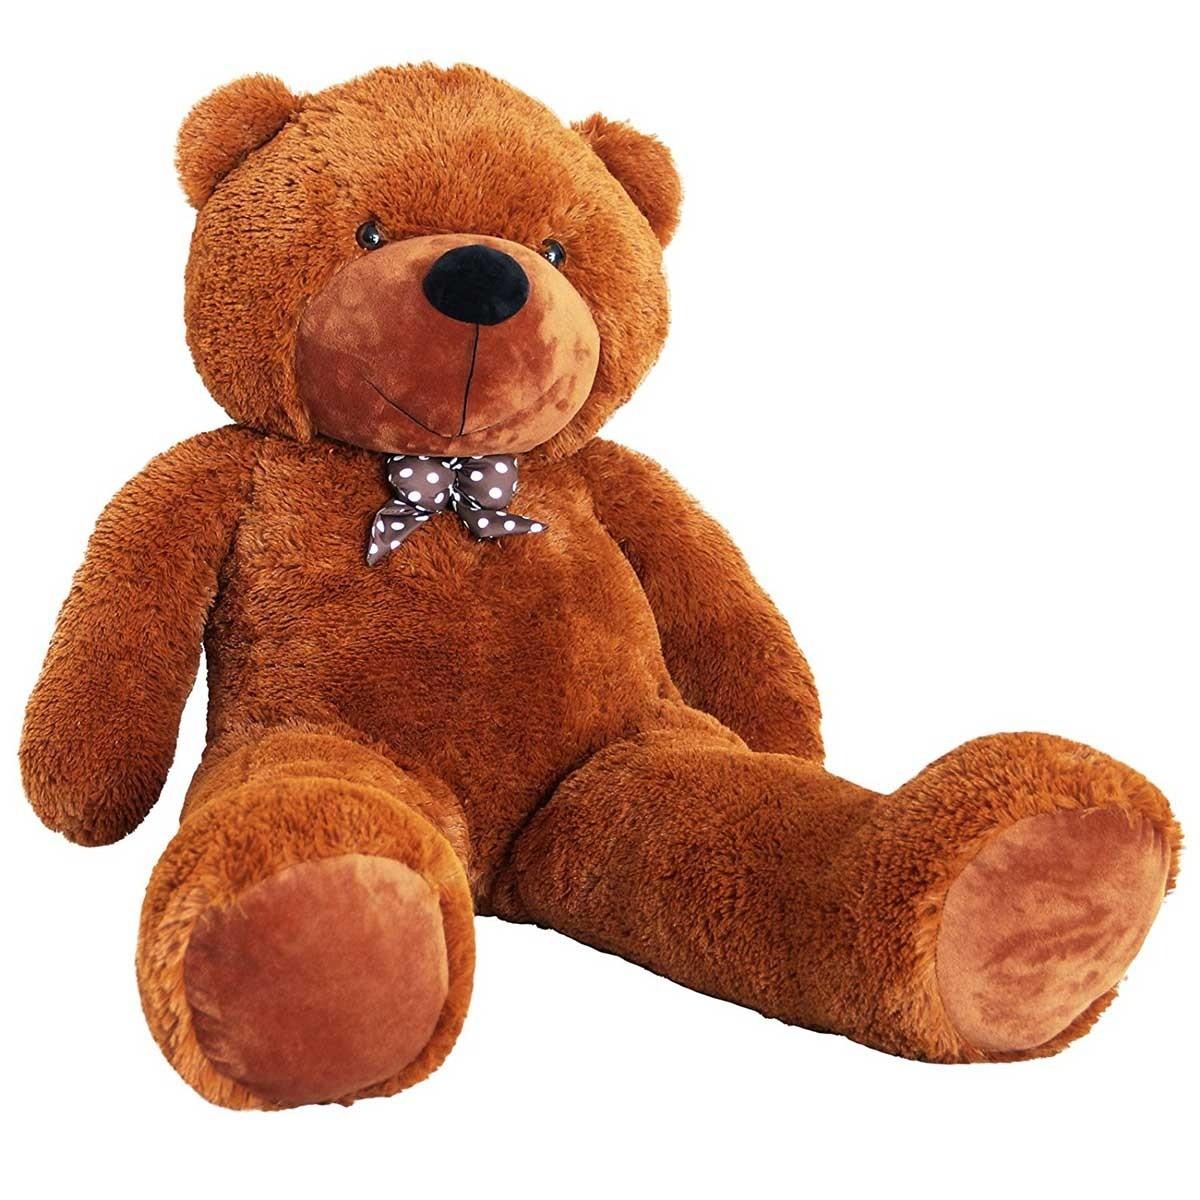 90cm Teddybär Plüschbär in Braun